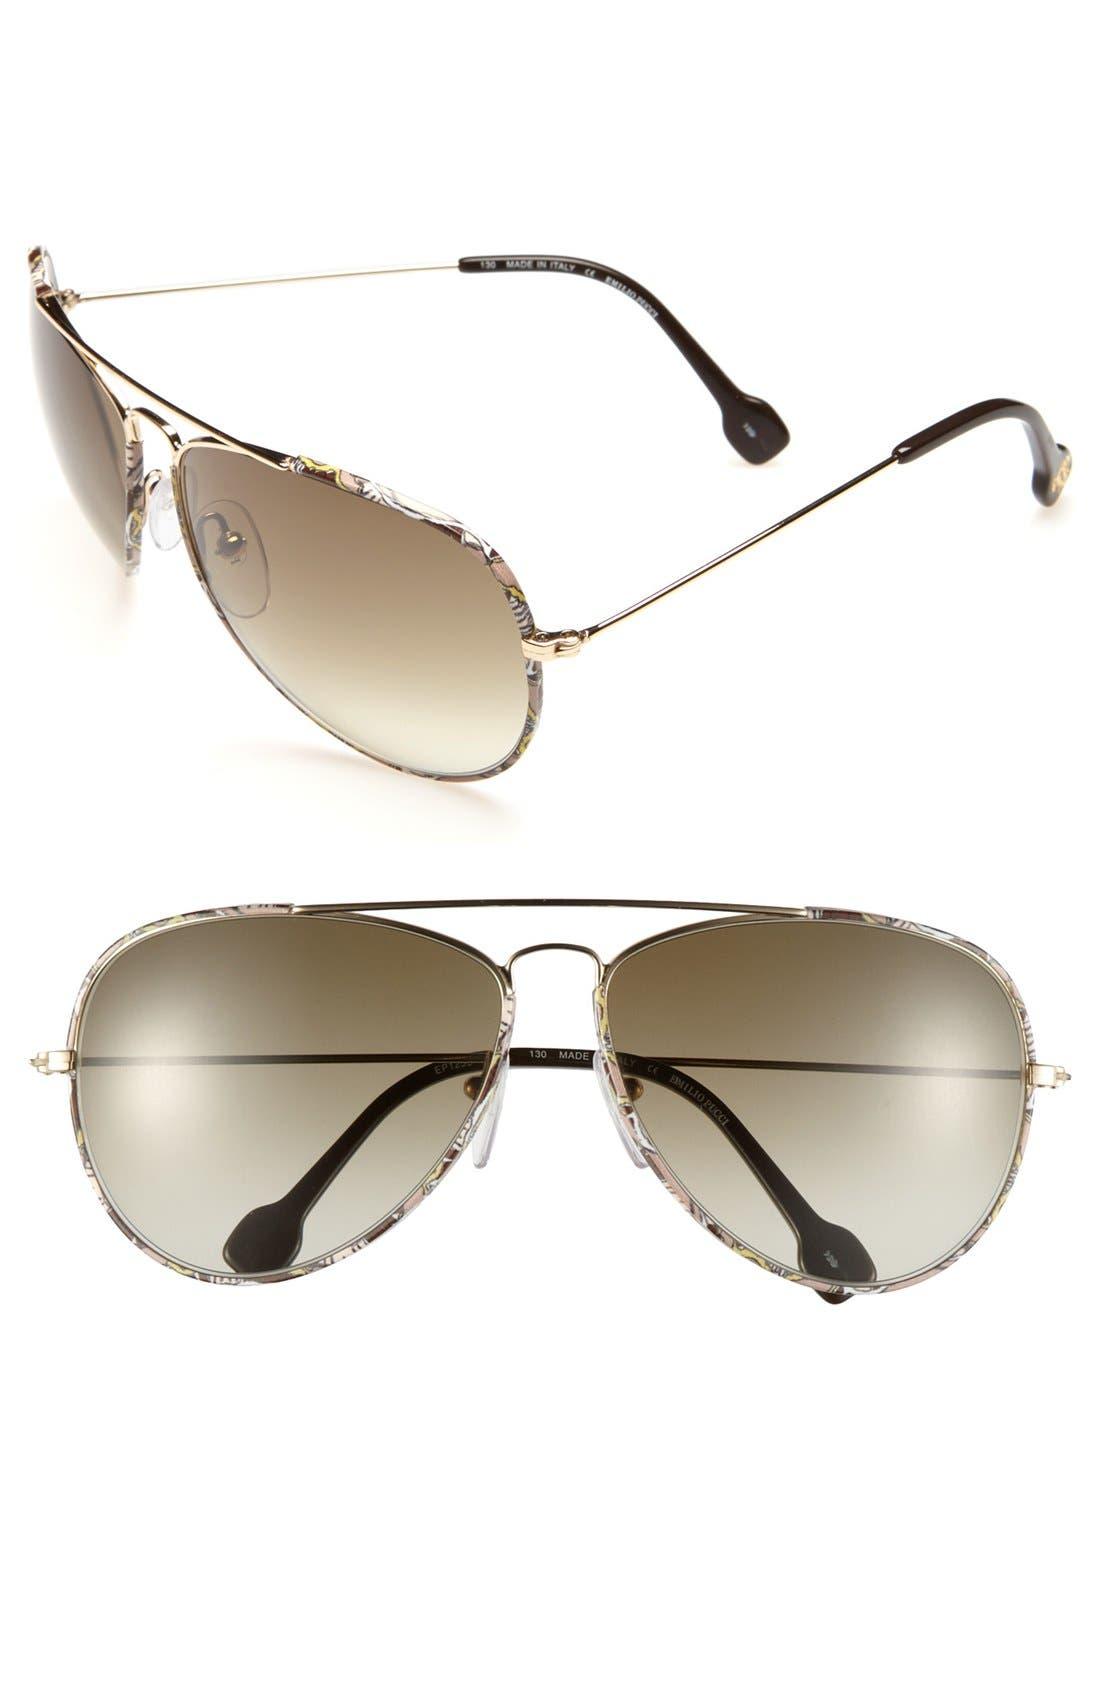 Main Image - Emilio Pucci 62mm Metal Aviator Sunglasses (Special Purchase)